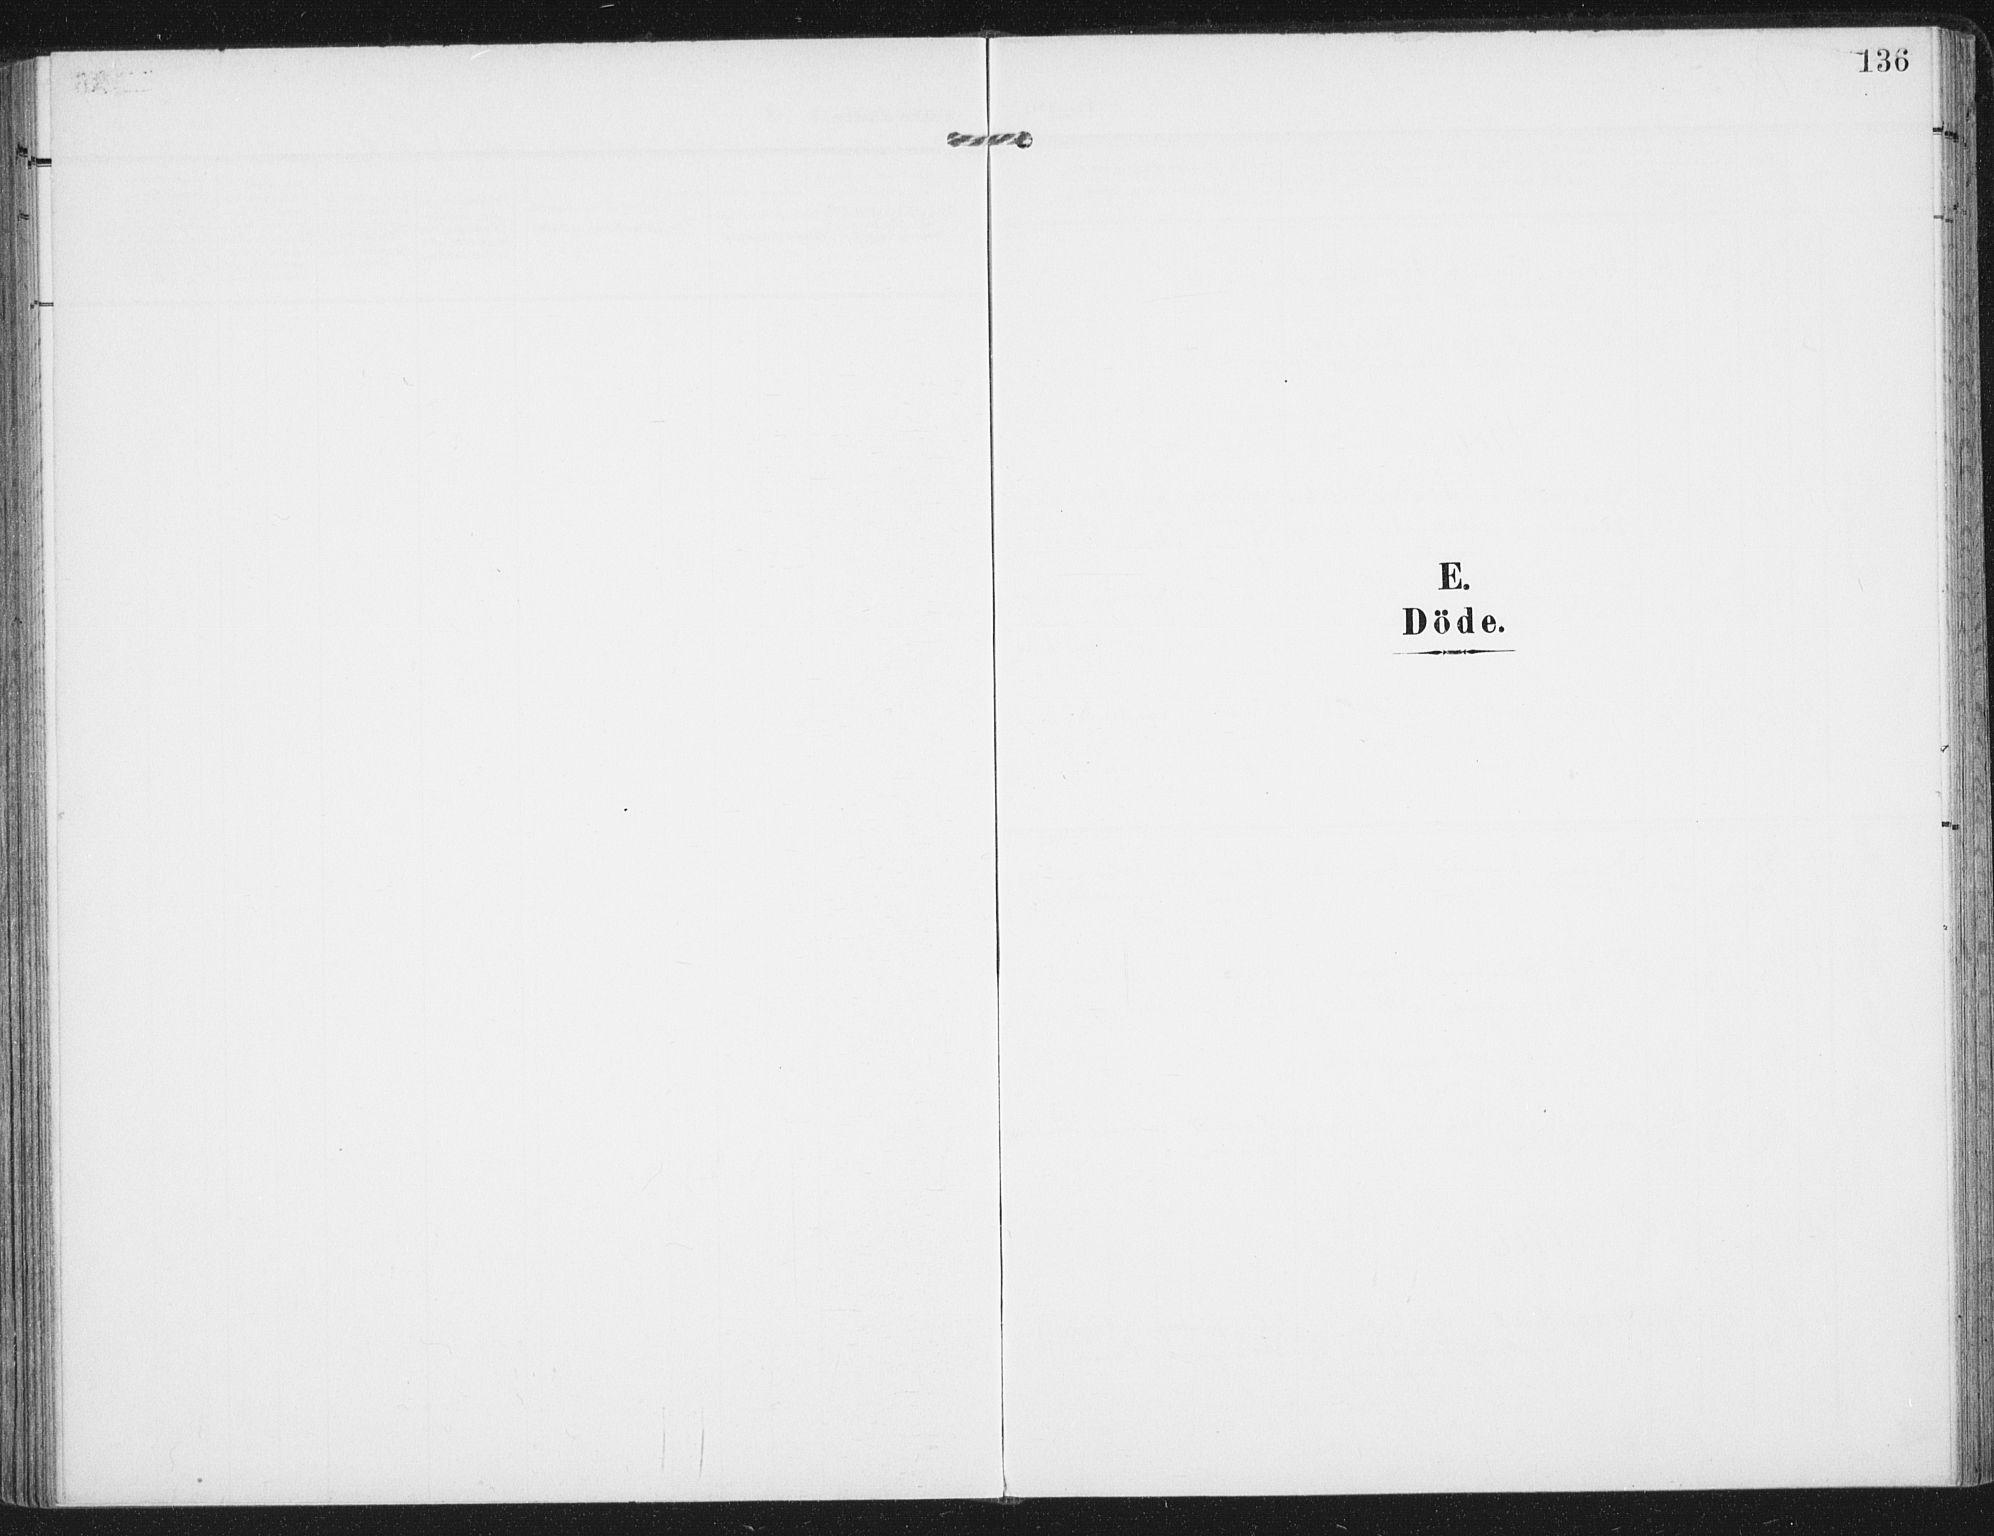 SAT, Ministerialprotokoller, klokkerbøker og fødselsregistre - Nordland, 885/L1206: Ministerialbok nr. 885A07, 1905-1915, s. 136